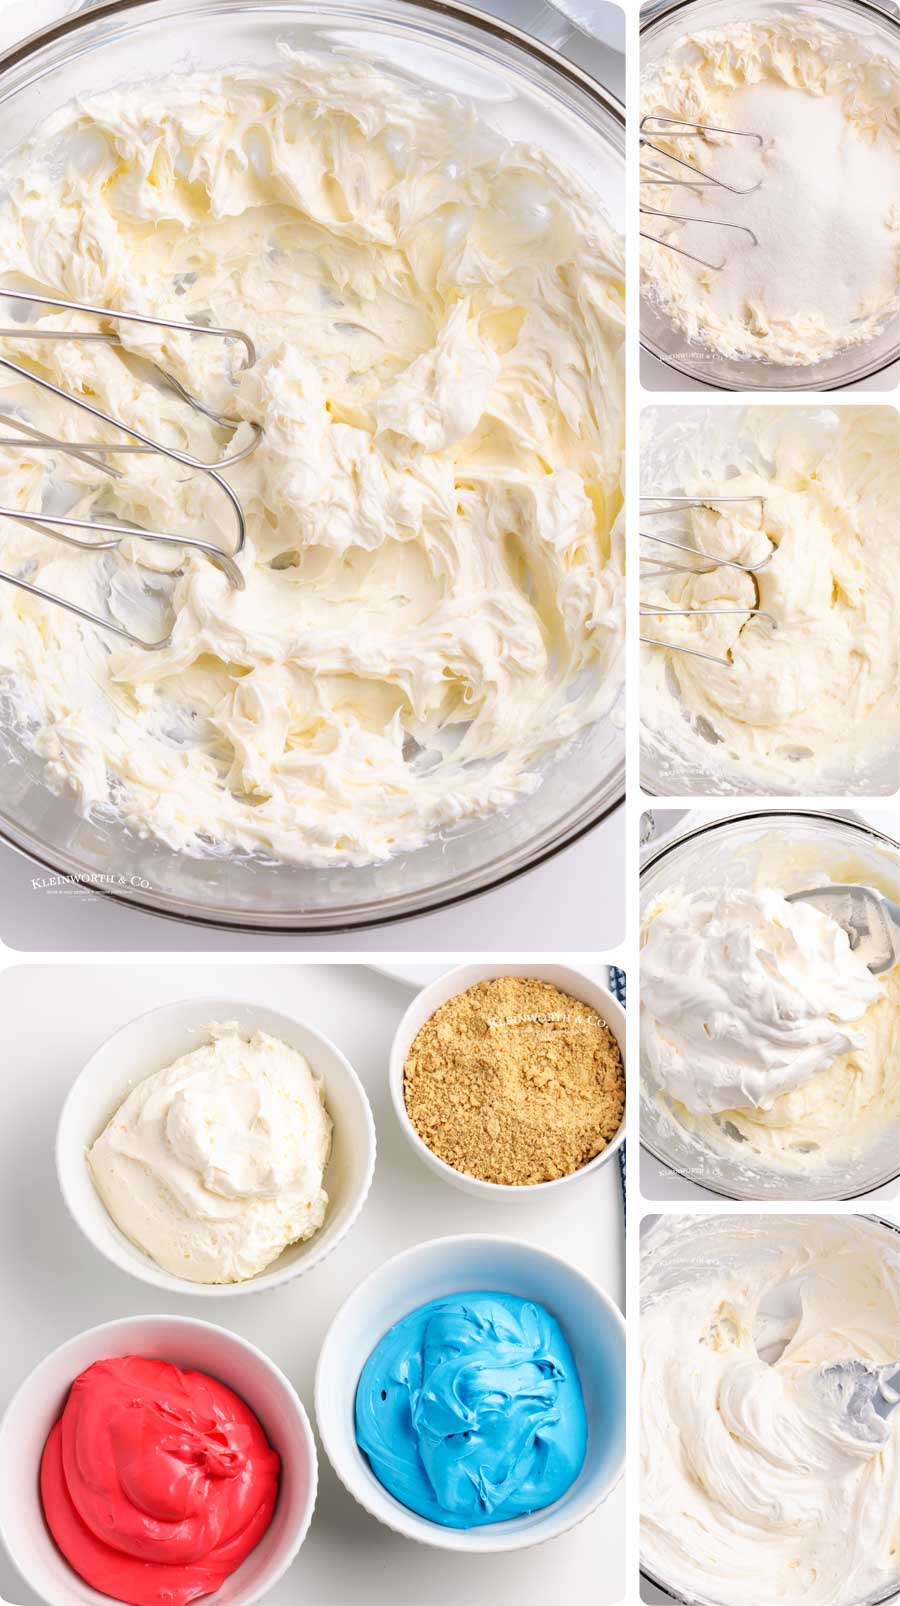 how to make No-Bake Cheesecake Cups